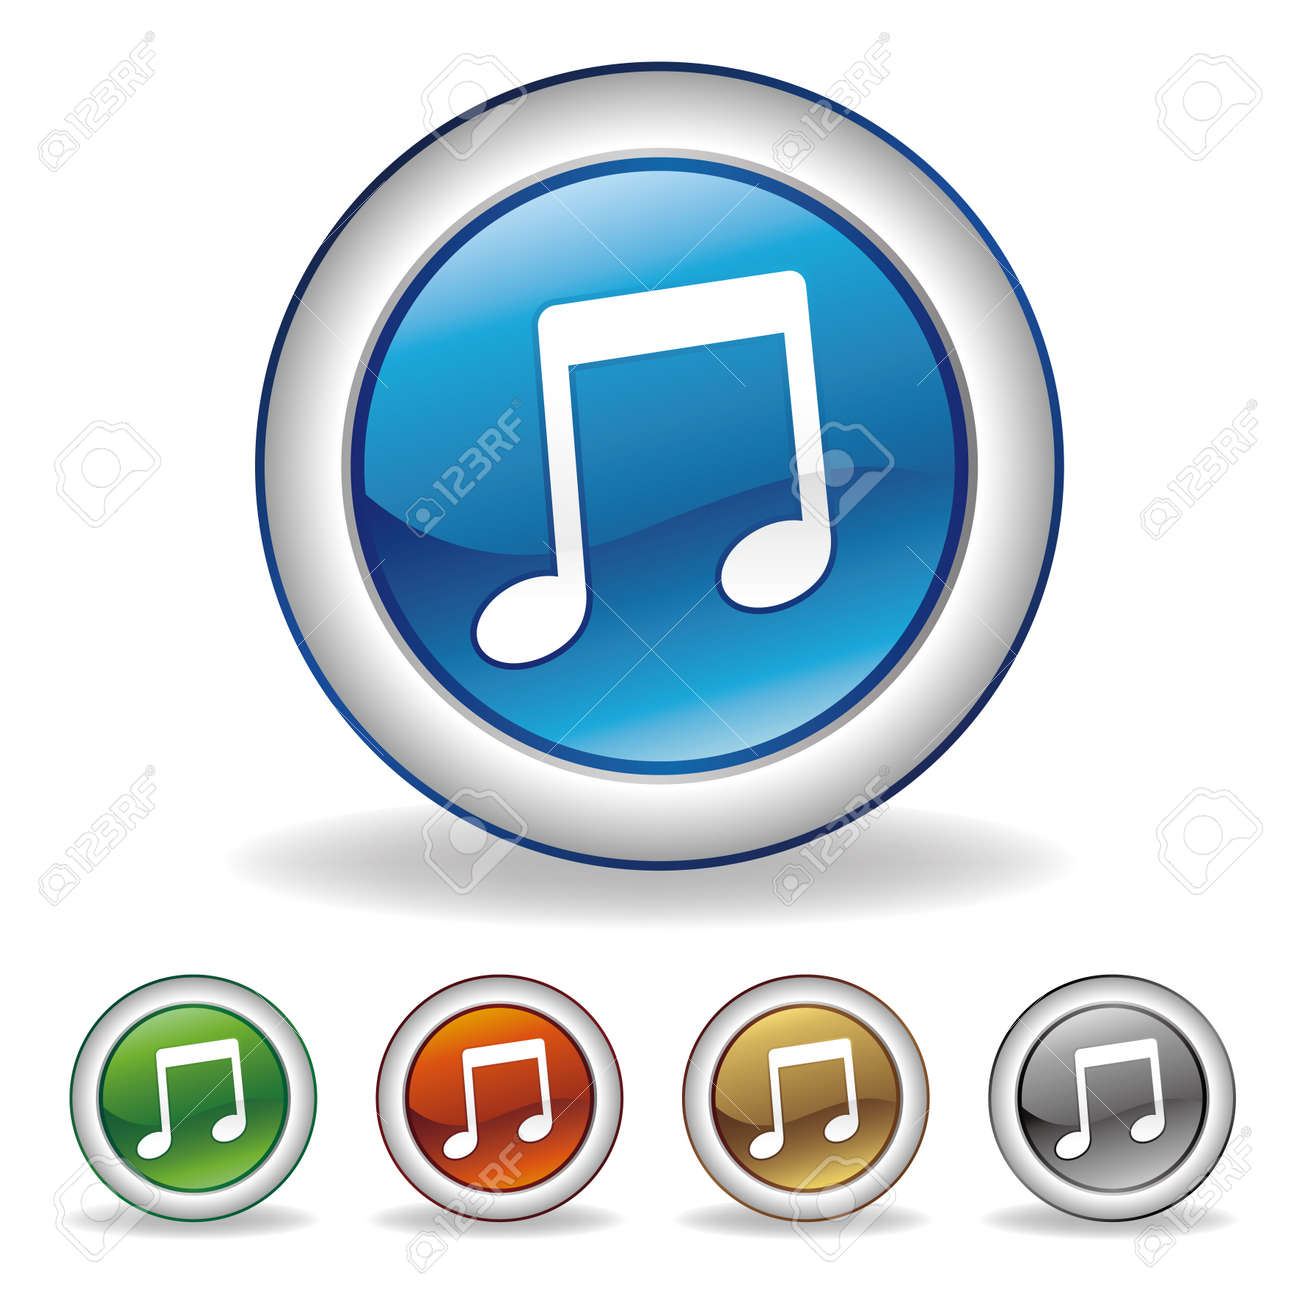 music icon set Stock Vector - 7528506